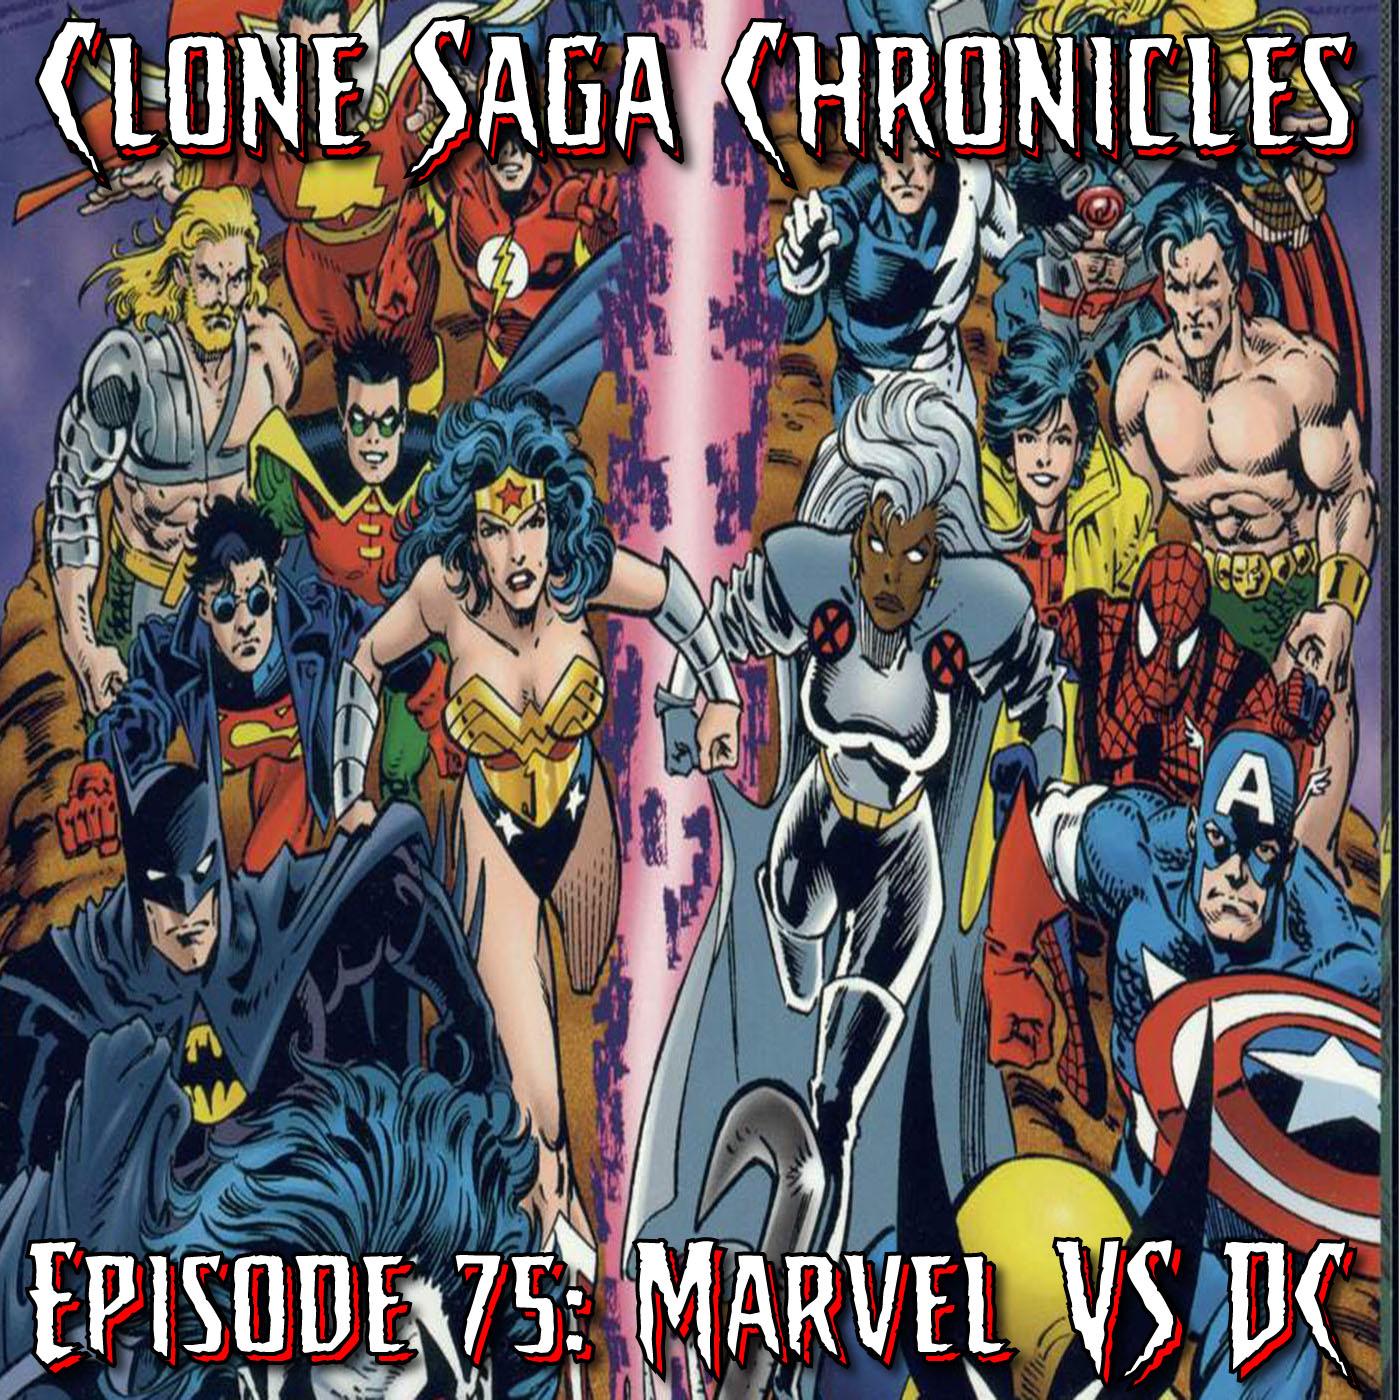 CSC Episode 75: DC vs. Marvel